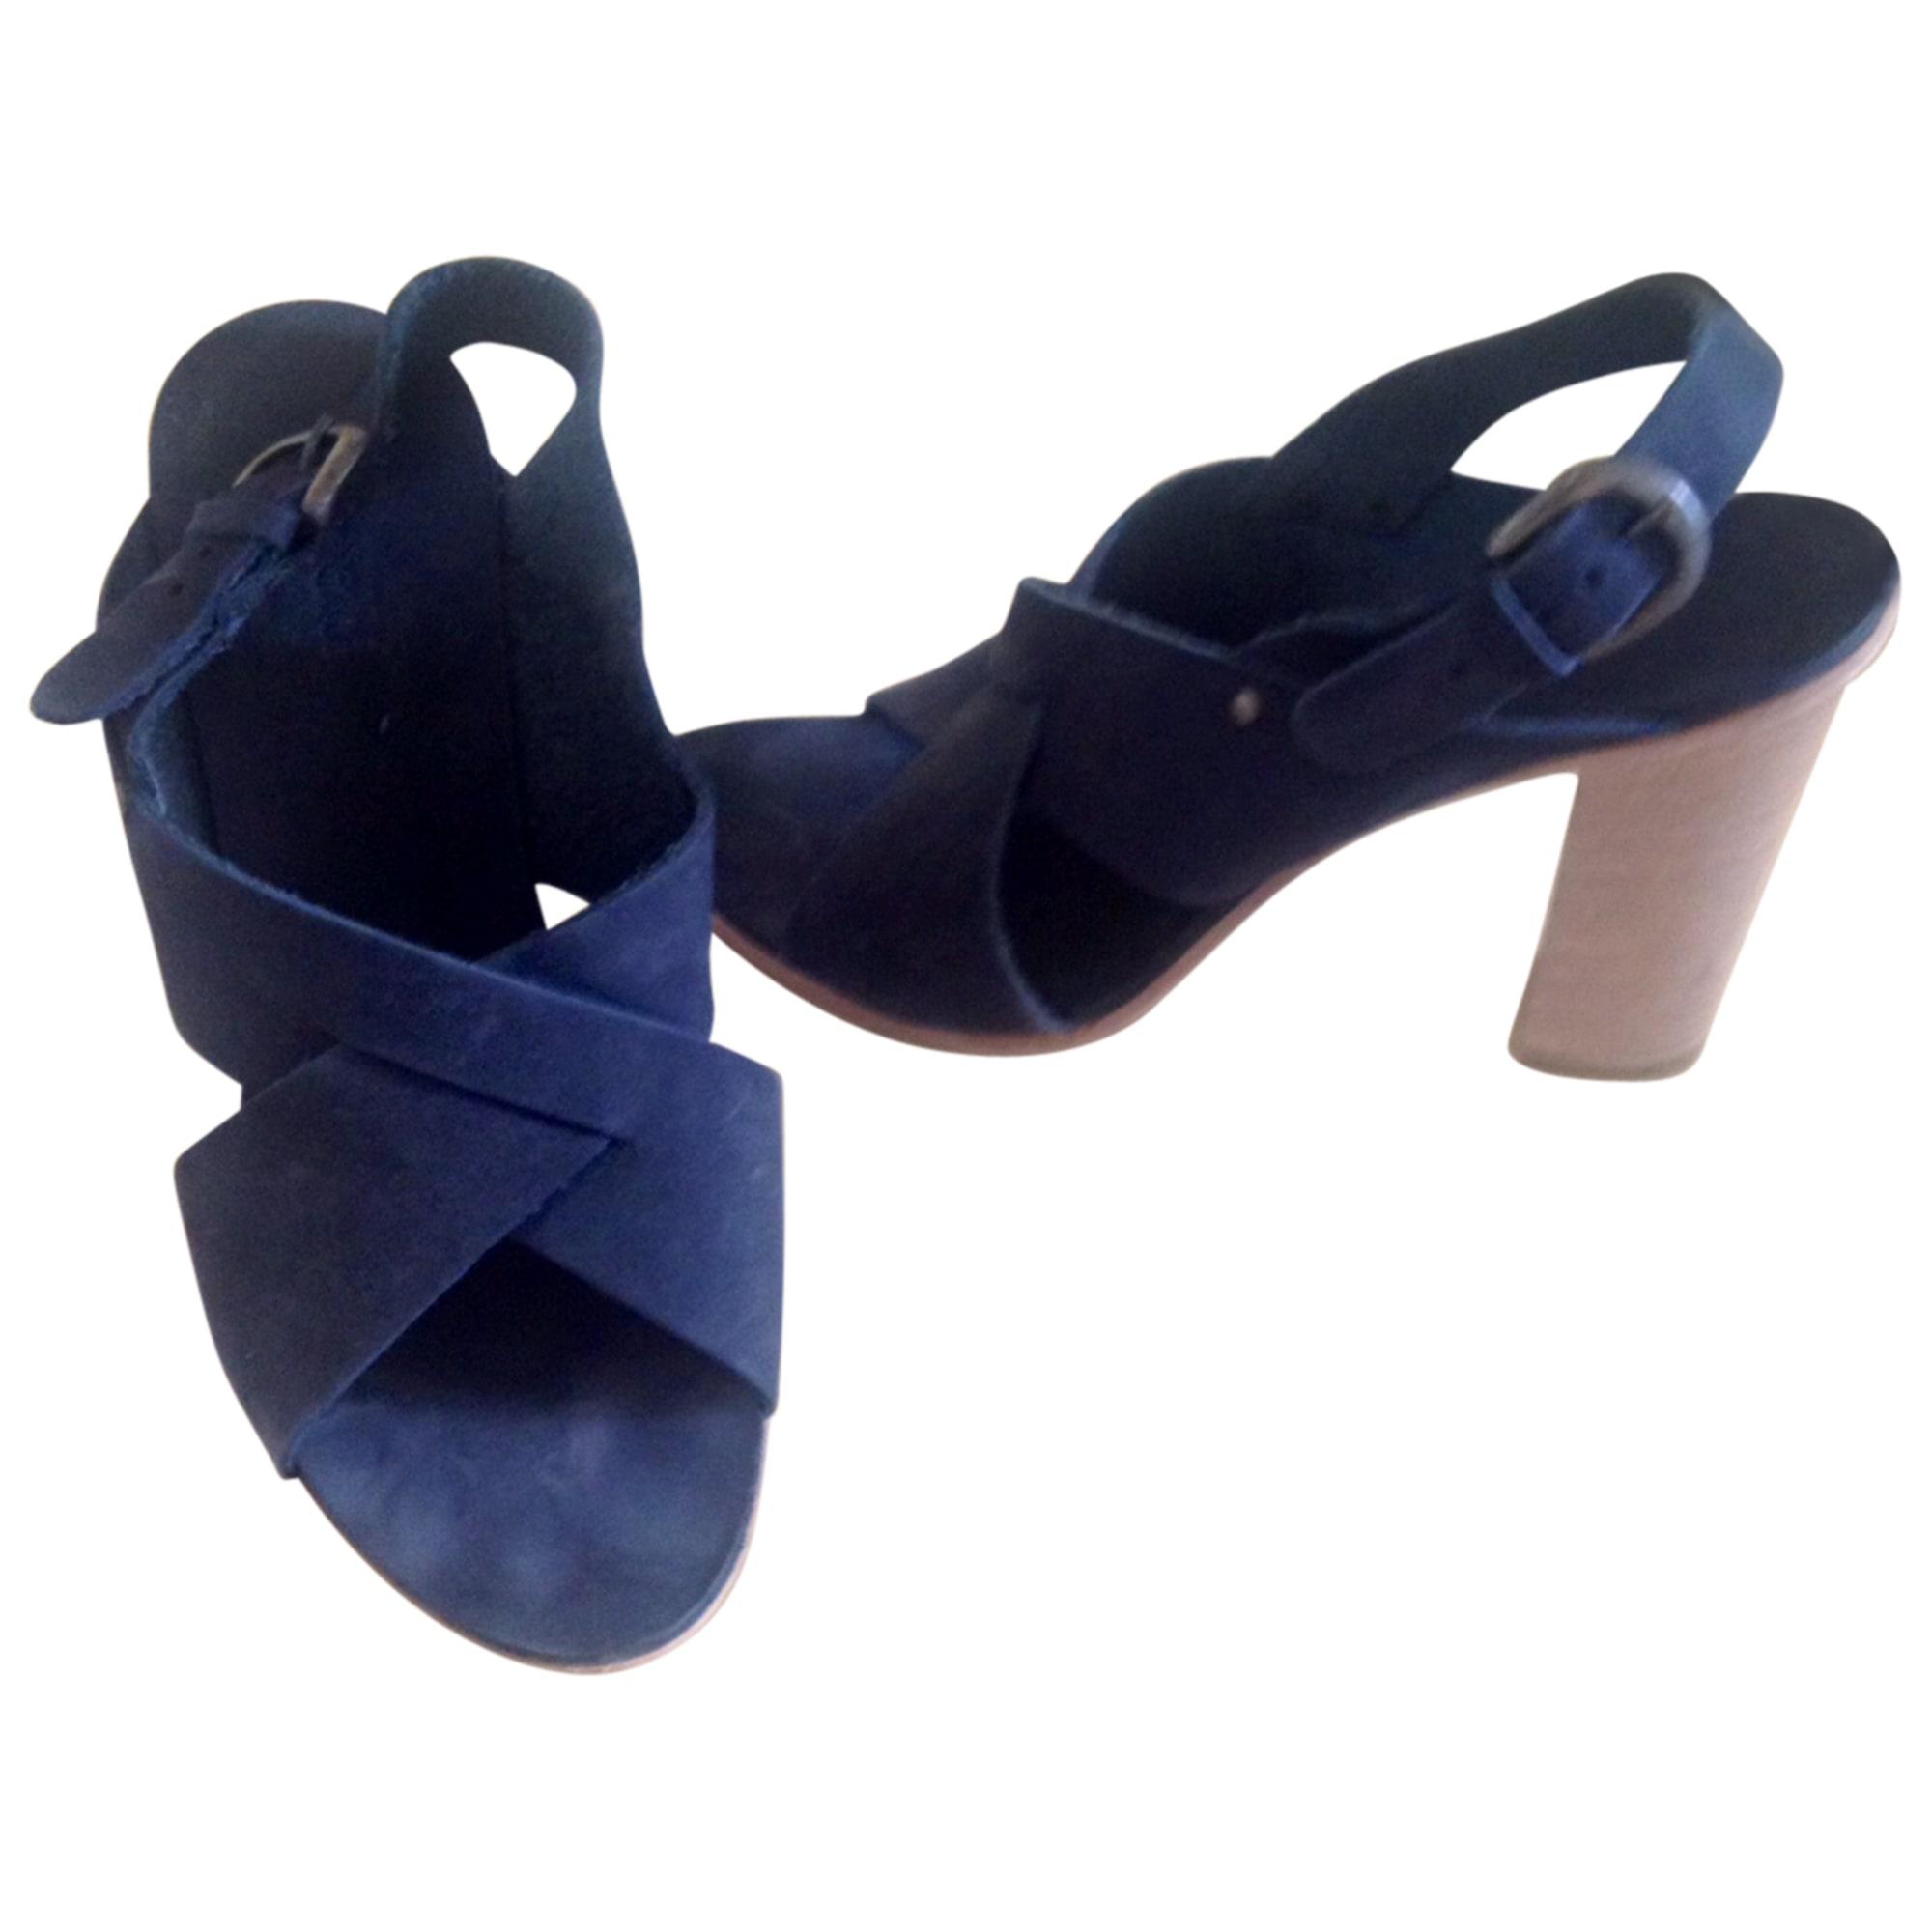 Sandali con tacchi MINELLI Blu, blu navy, turchese